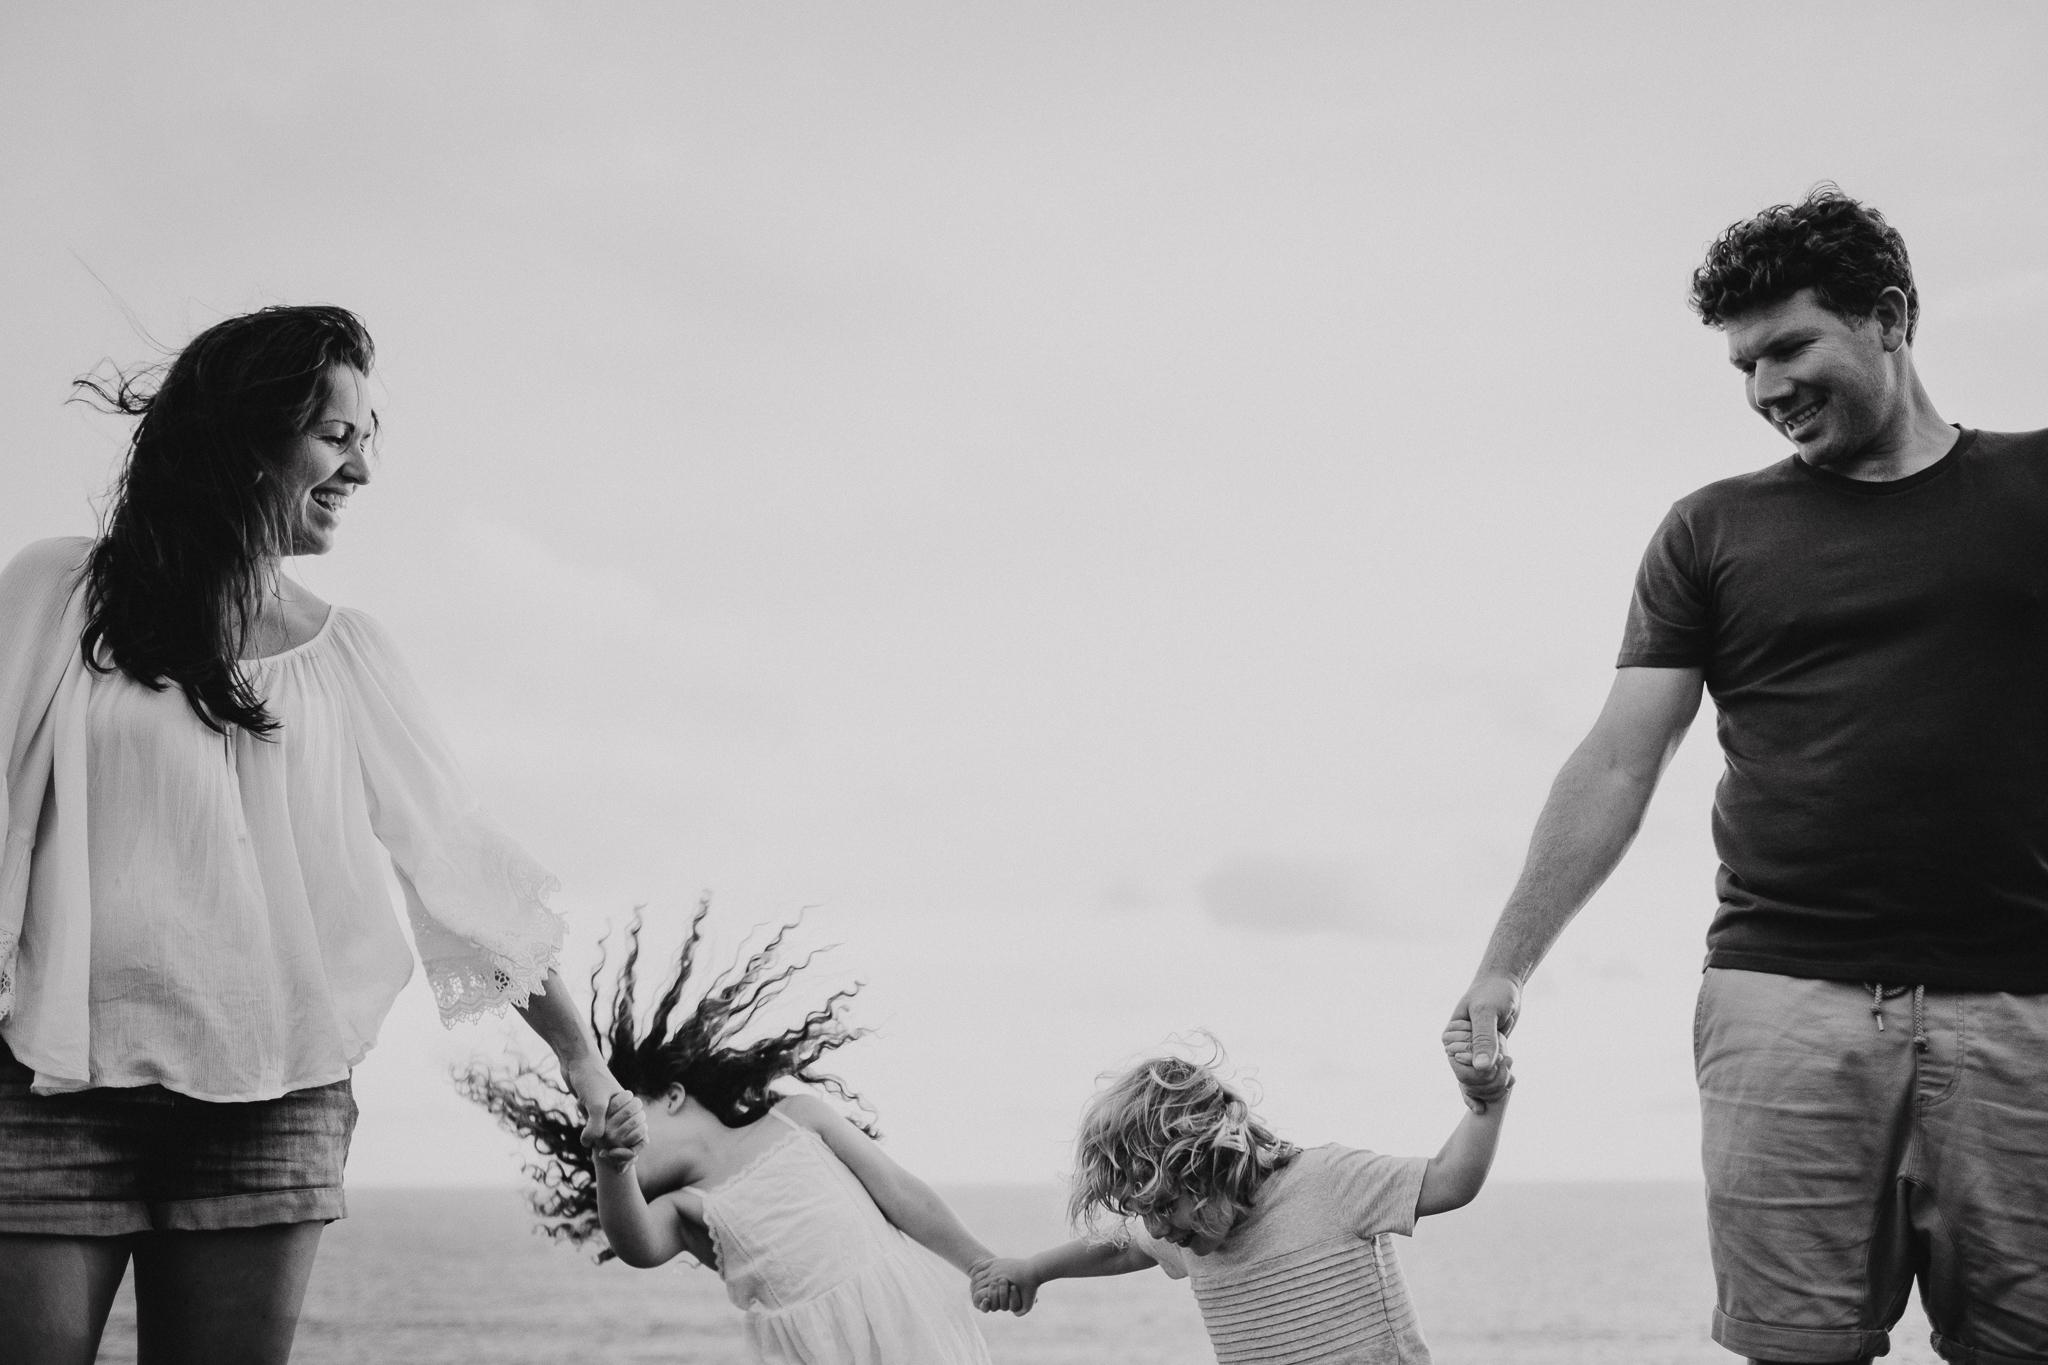 Family Beach Photography (33 of 35).jpg